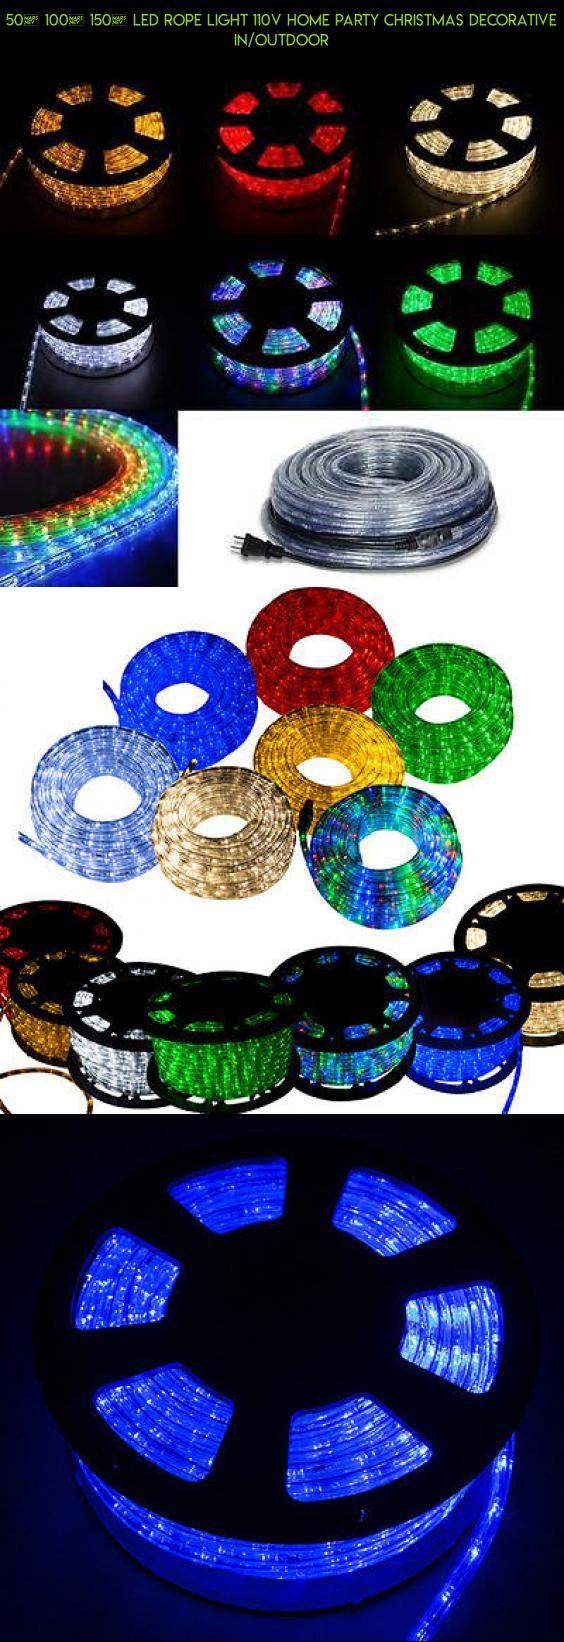 50 100 150 led rope light 110v home party christmas decorative in 50 100 150 led rope light 110v home party christmas decorative in aloadofball Images